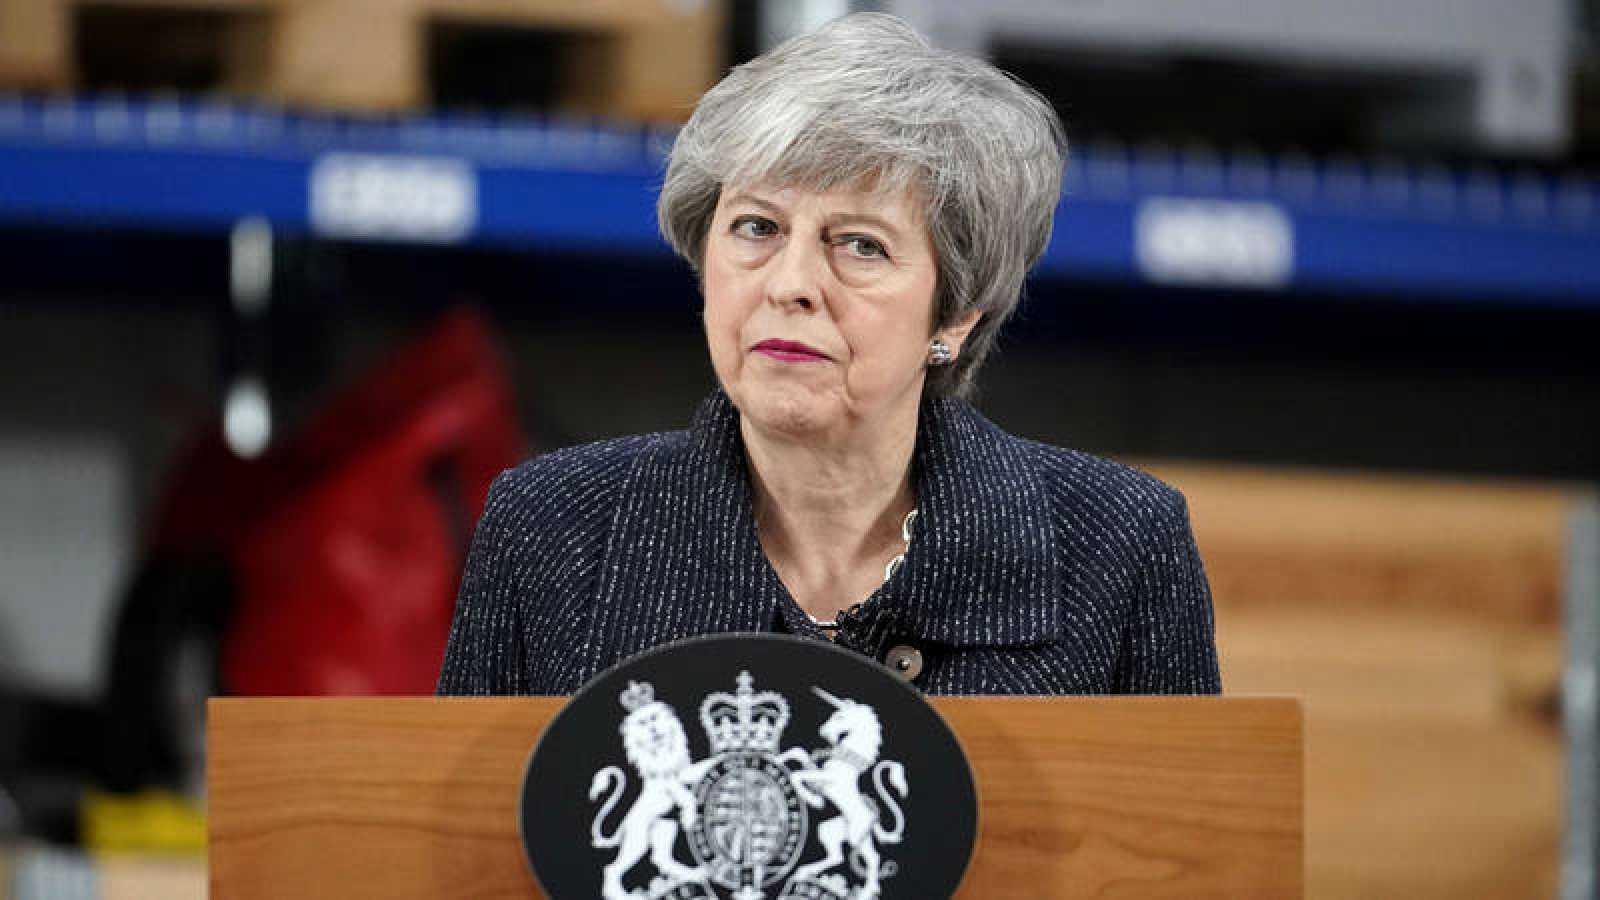 La primera ministra británica, Theresa May, pronuncia un discurso en Grimsby